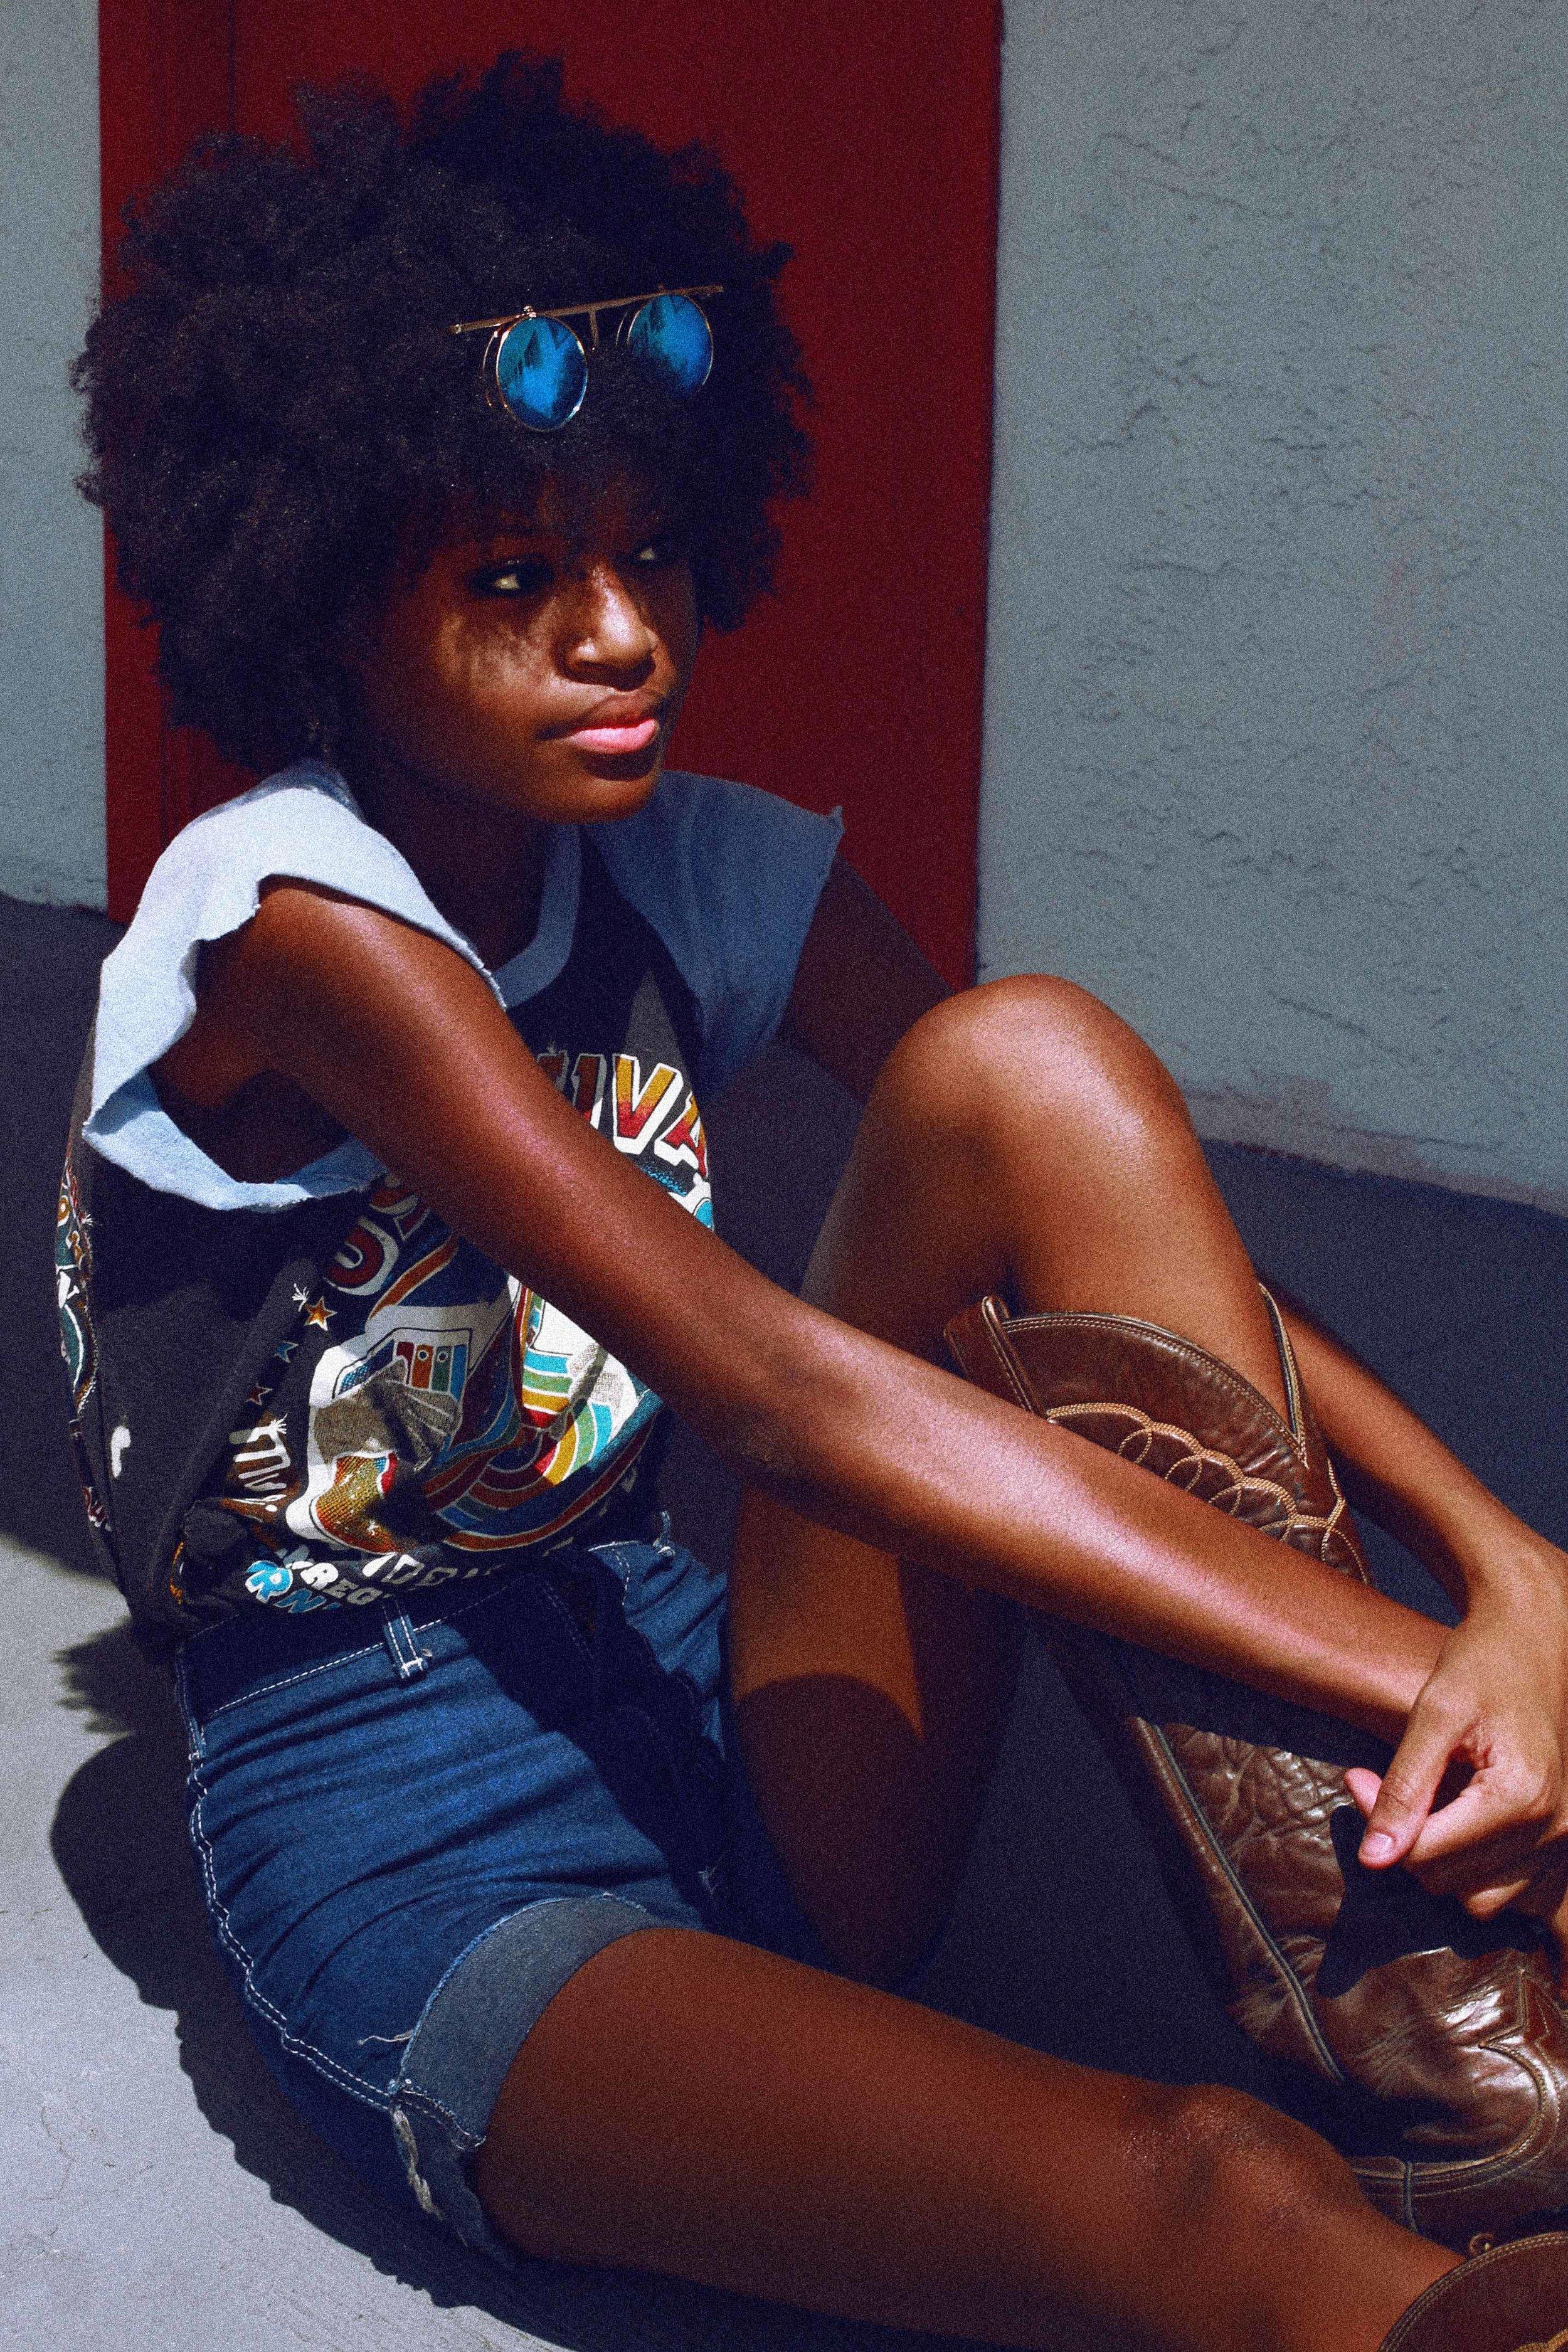 FUN CITY MOTEL - Vintage Retro AFRO Fashion Photo Shoot Story shot in Las Vegas by Alyssa Risley - IG @alyssarisley